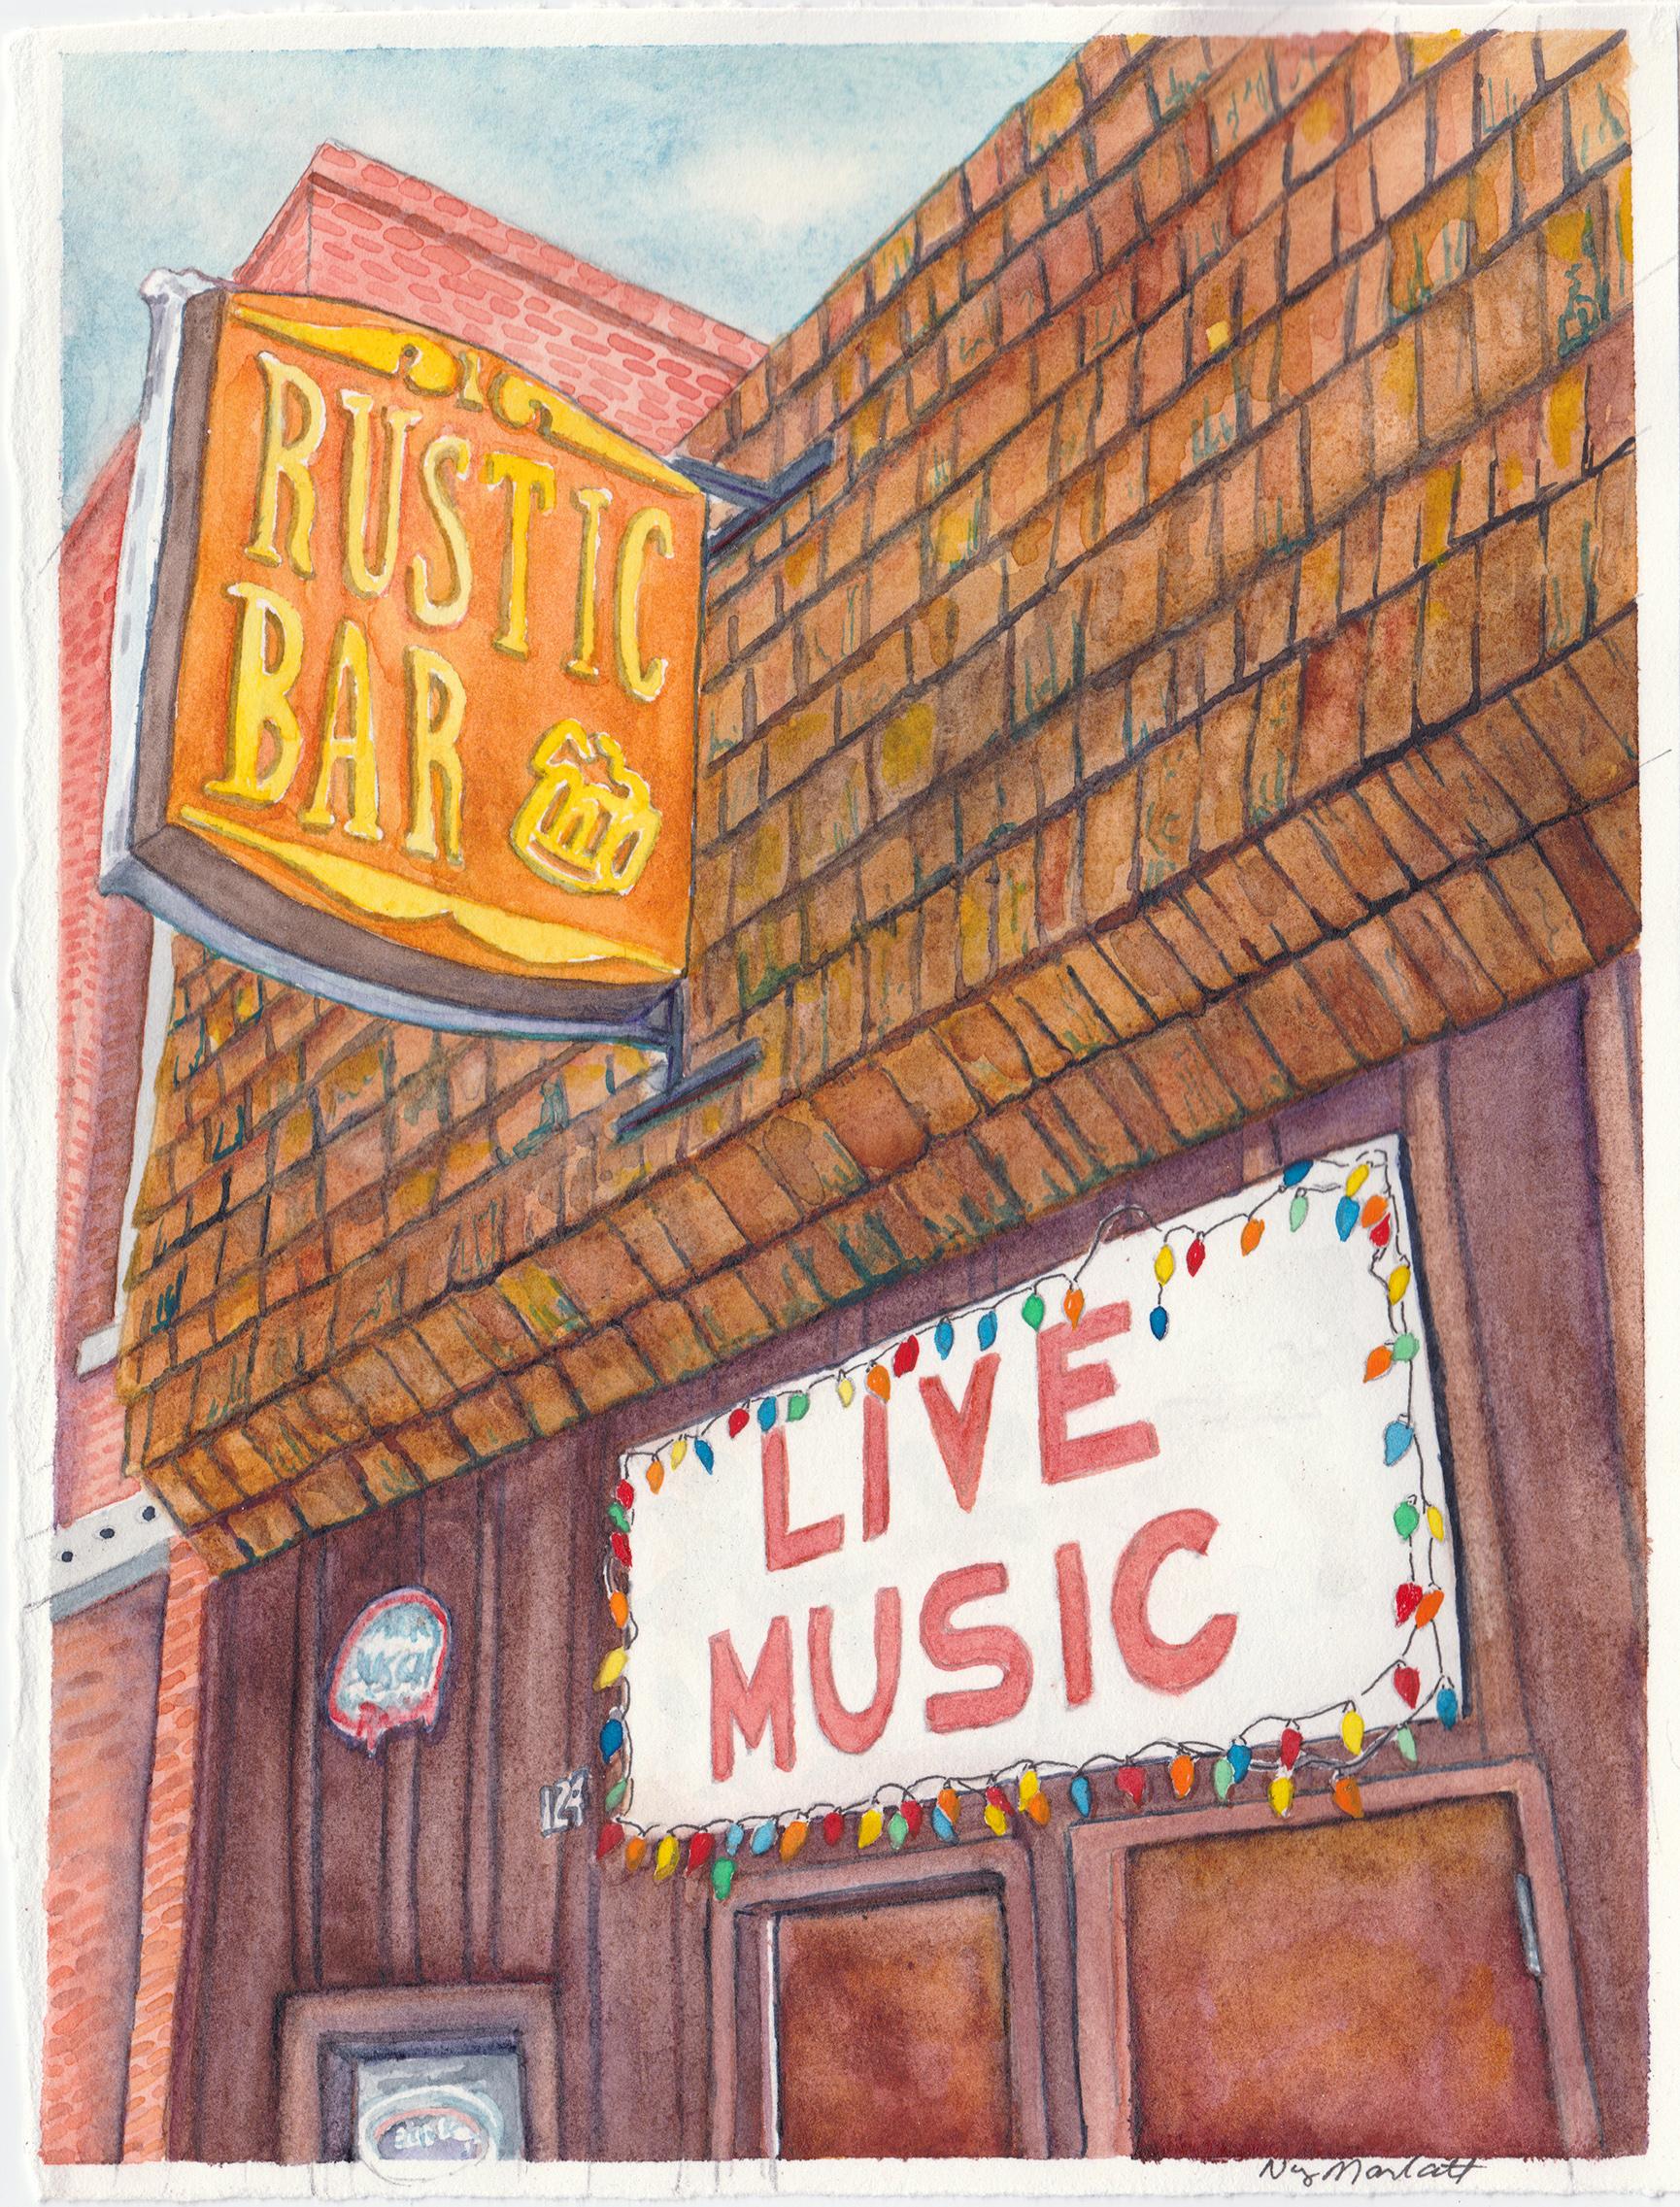 """The Rustic Bar"", watercolor, 5"" x 7"", 2018 by Nancy Marlatt"